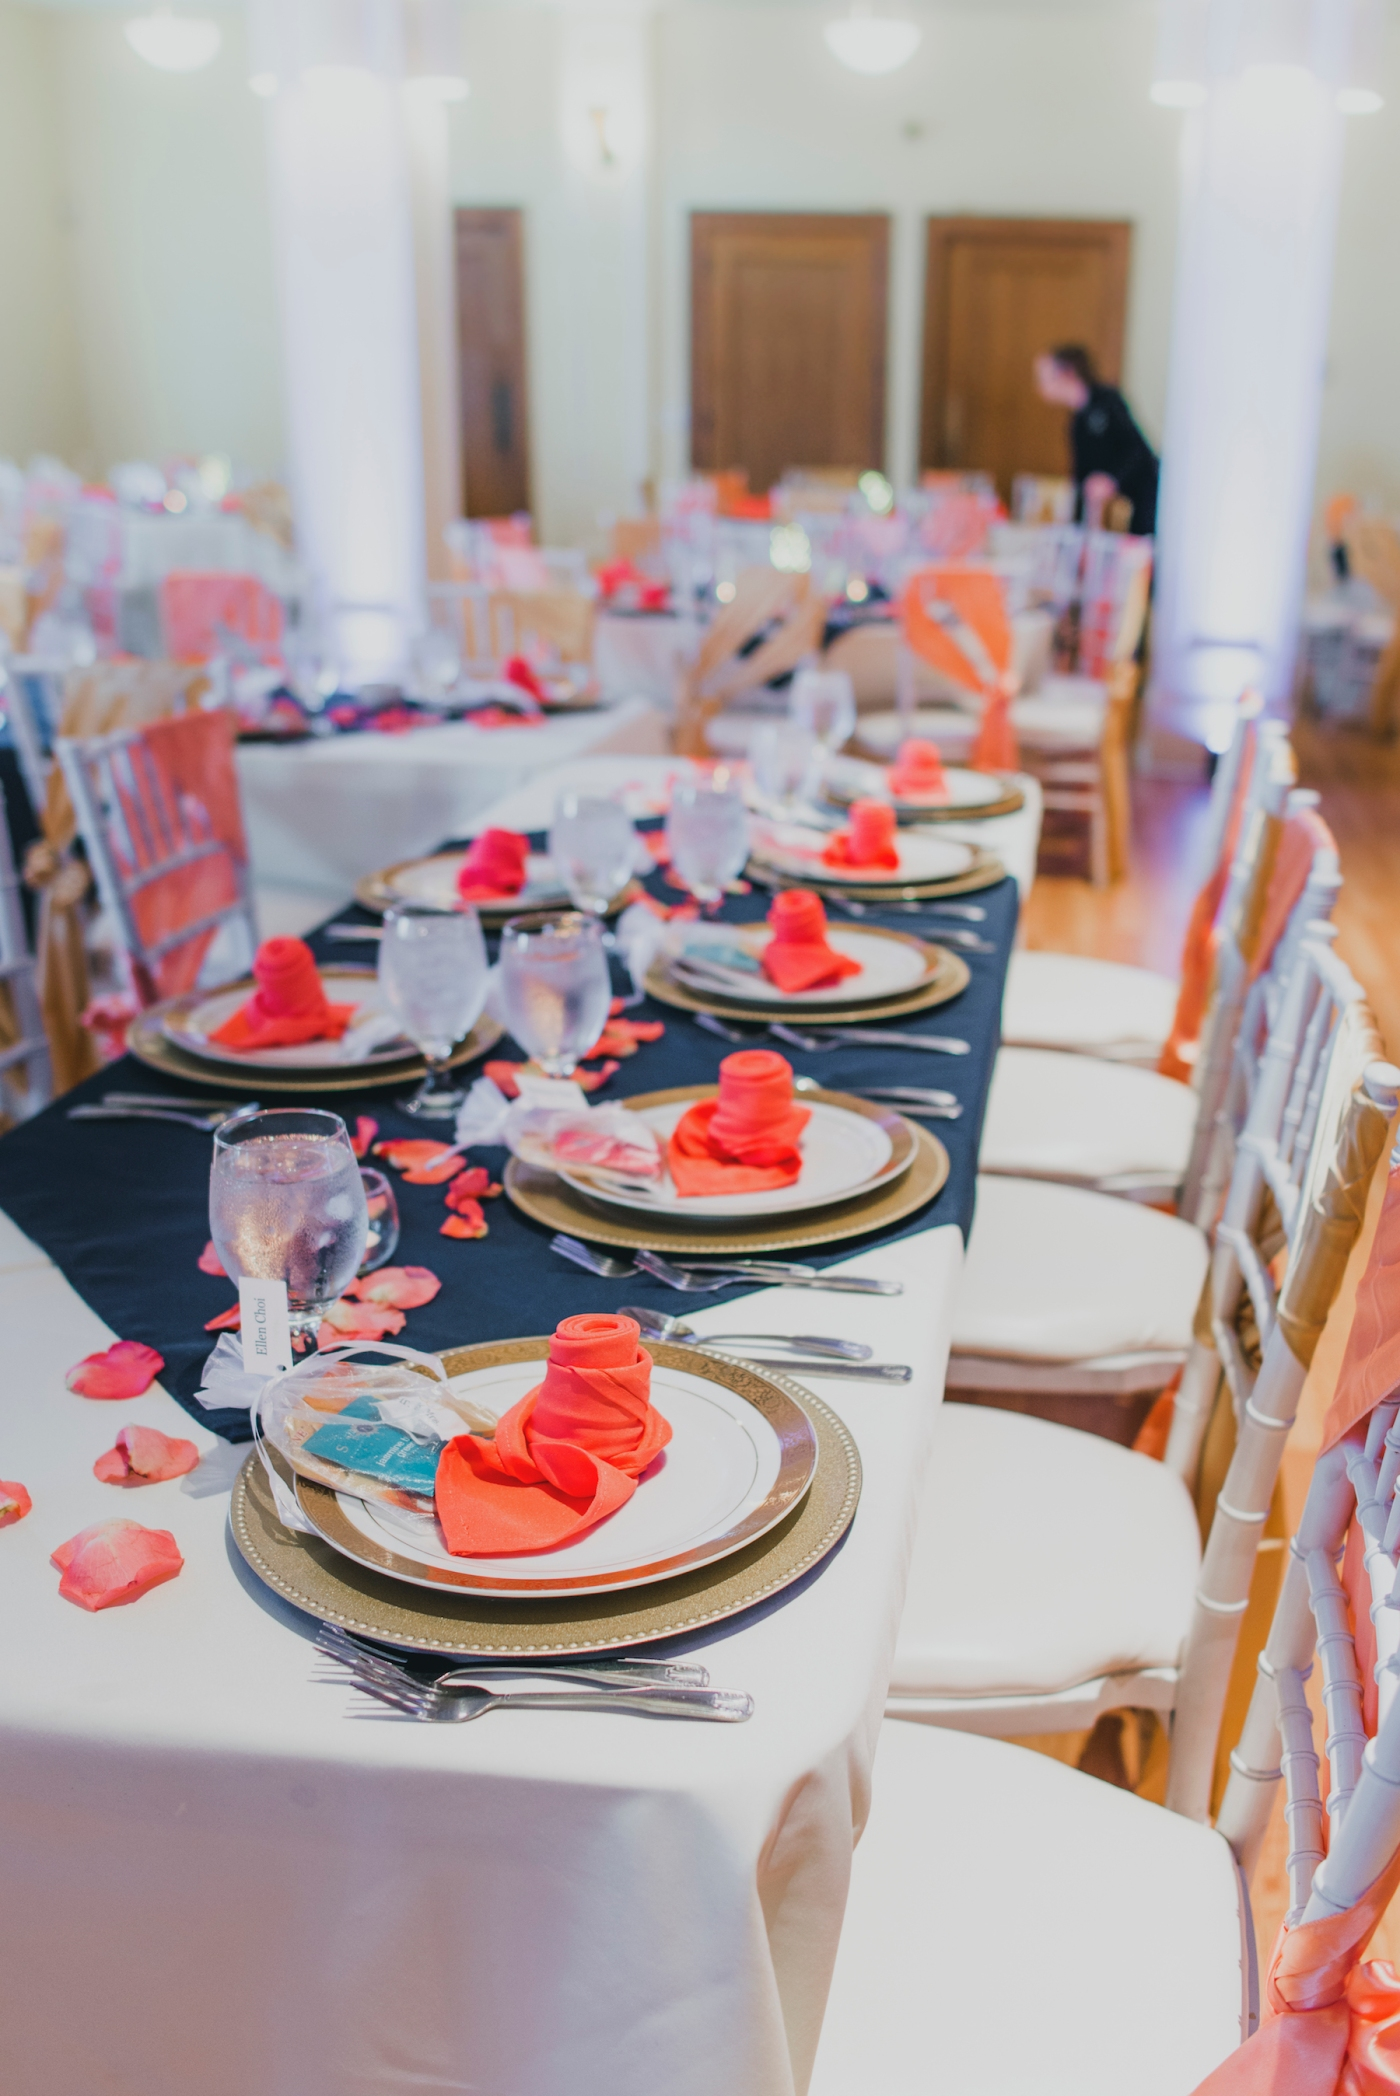 DSC_3076Everett_Wedding_Ballroom_Jane_Speleers_photography_Rachel_and_Edmund_cake cutting_2017